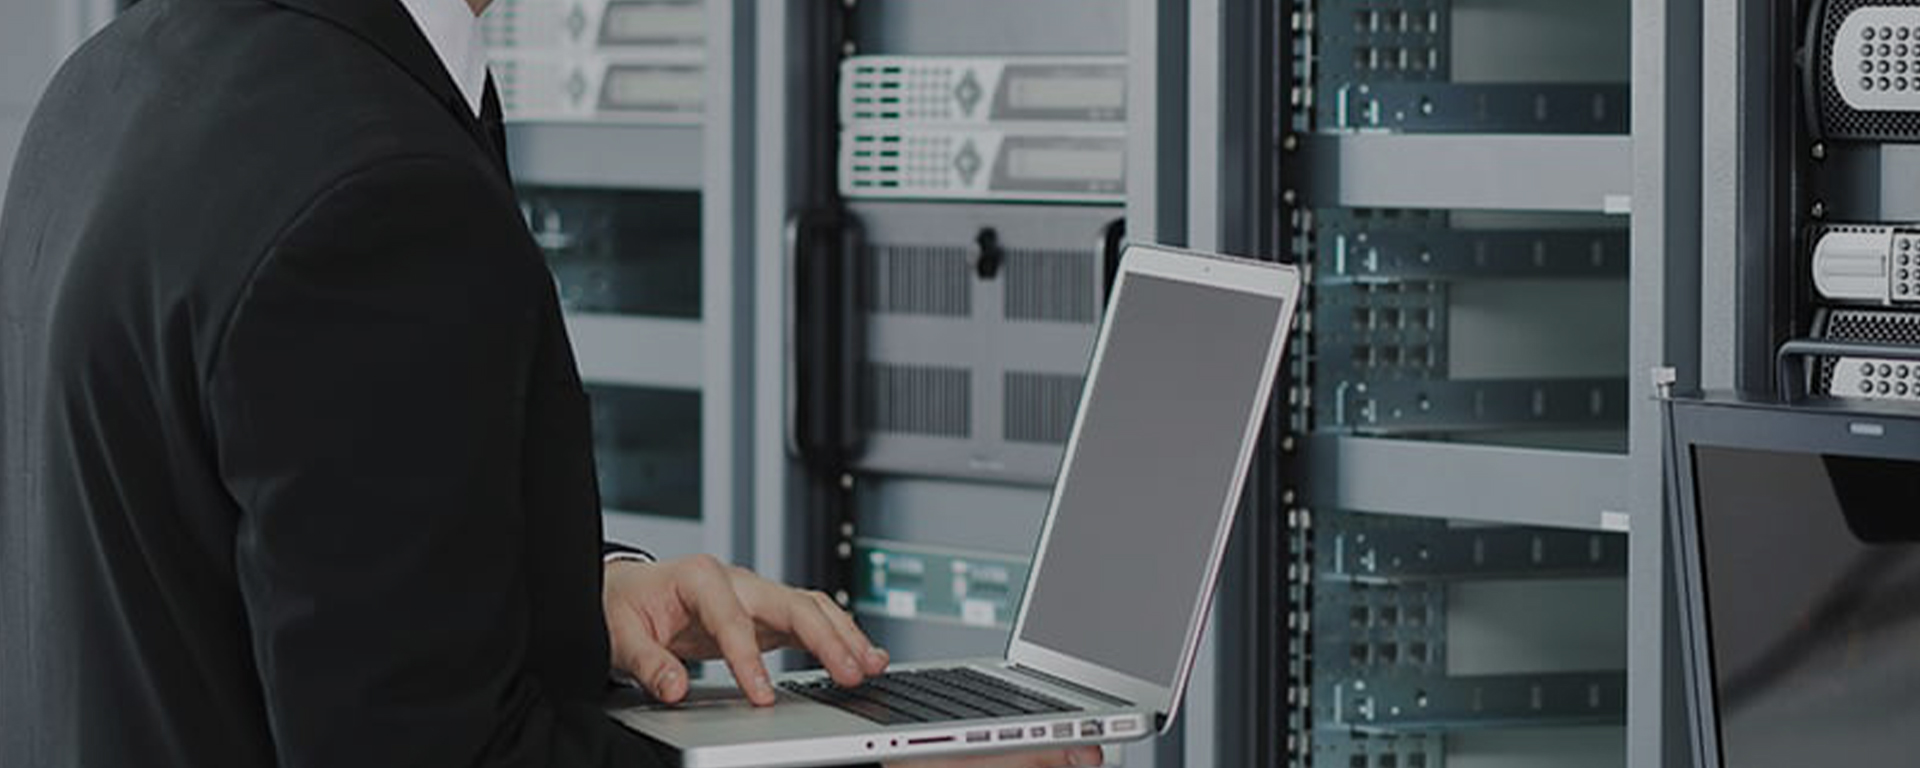 Recrutement informatique et telecom (IT)